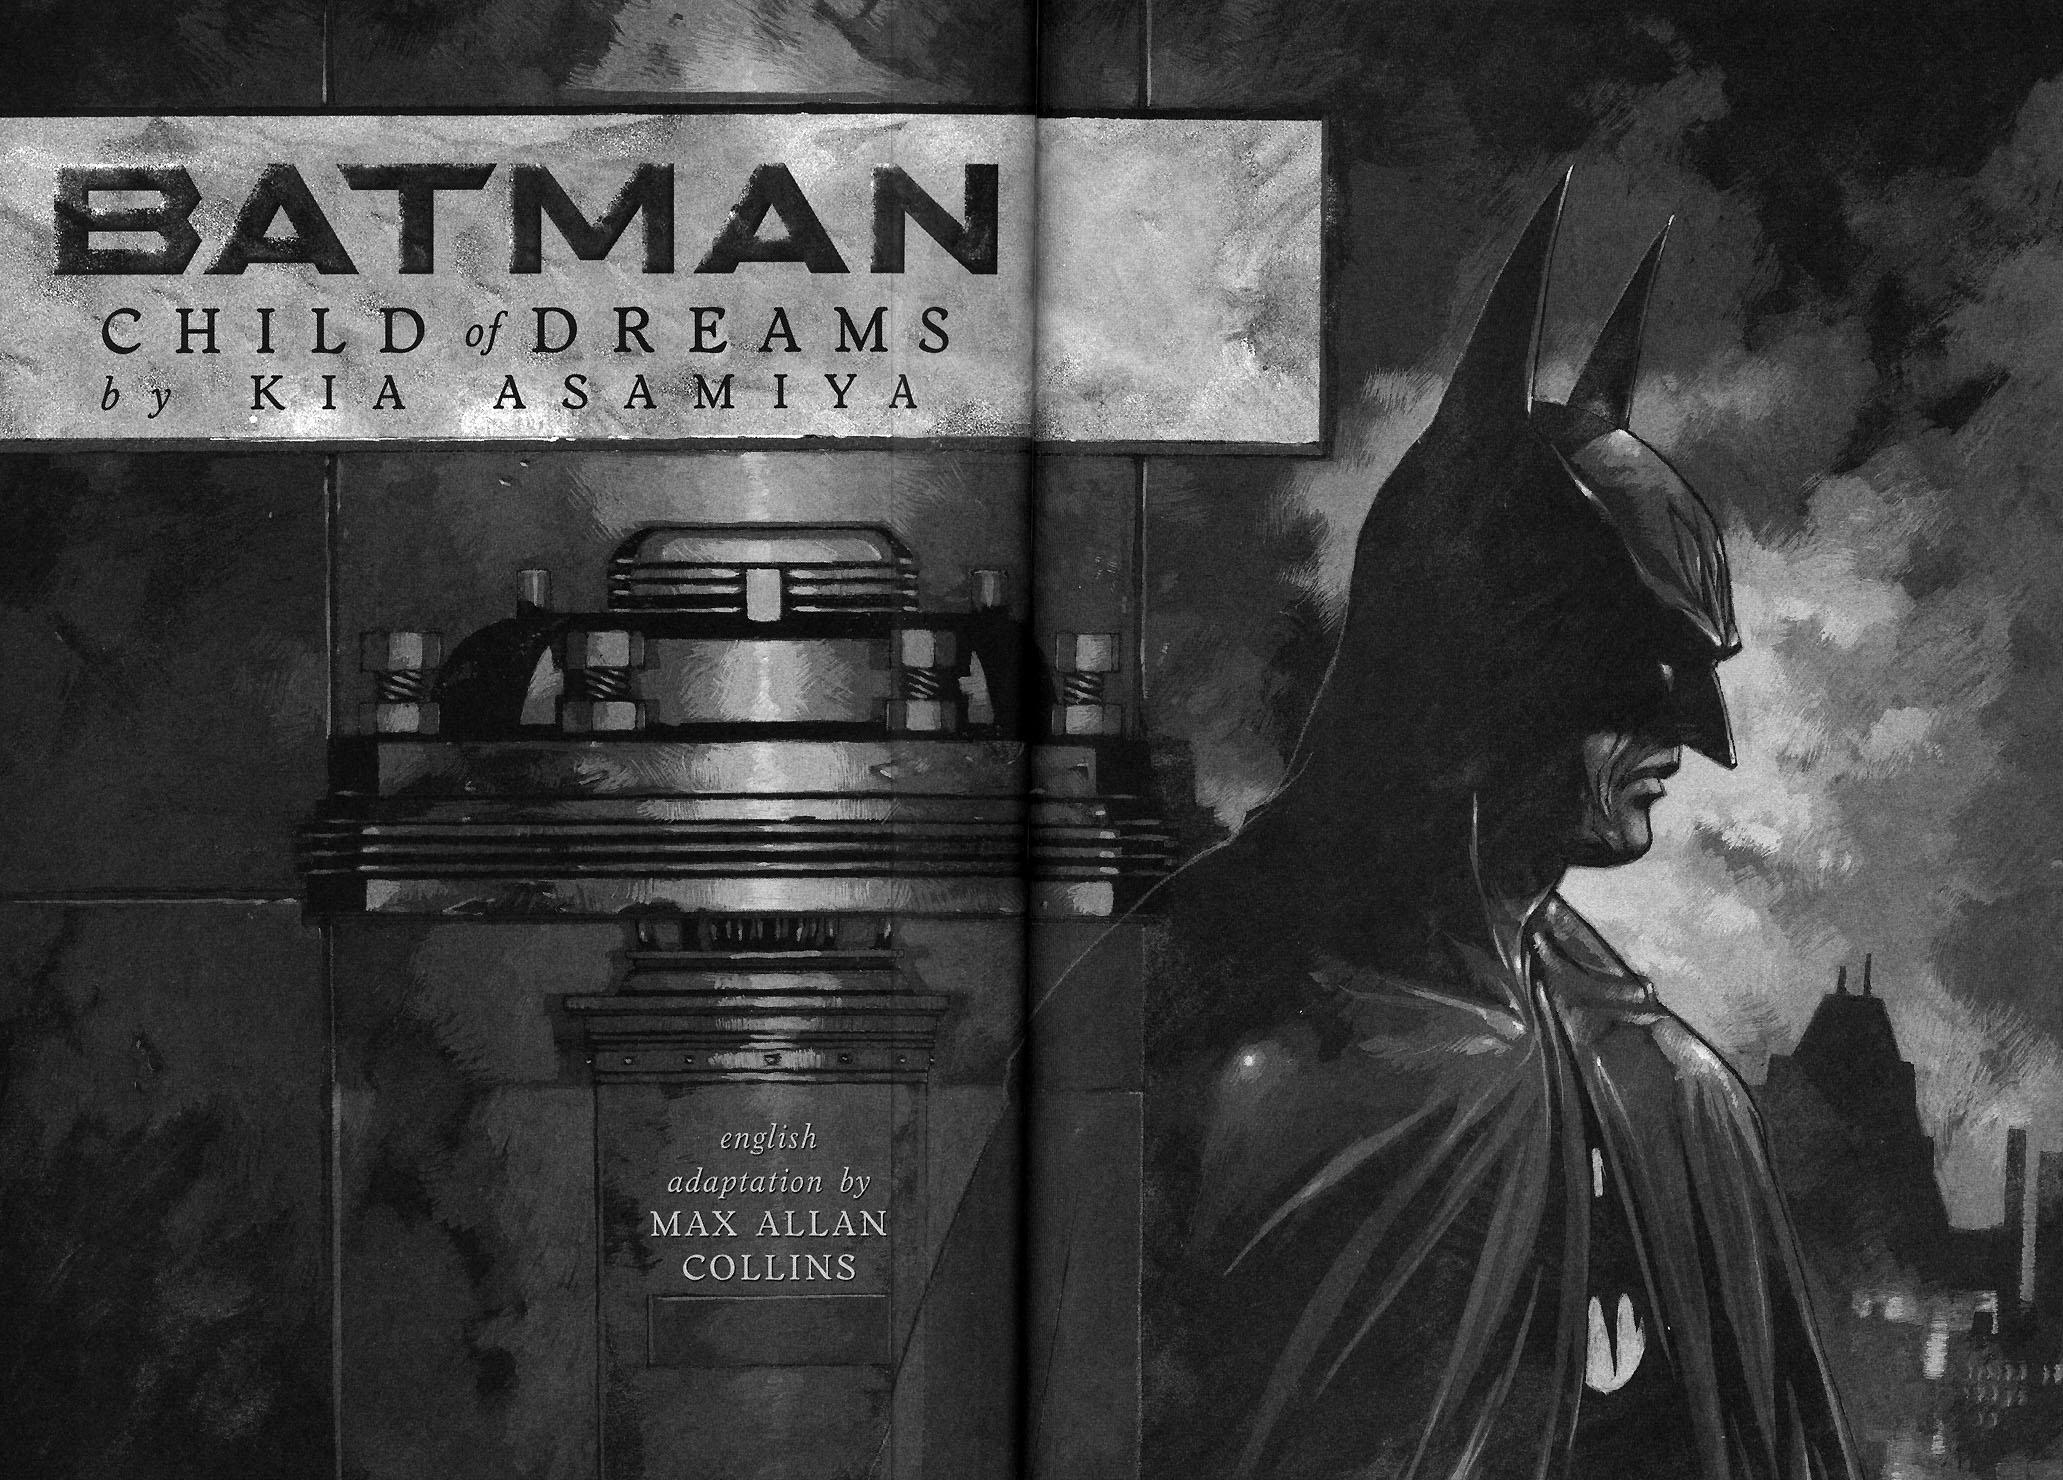 Read online Batman: Child of Dreams comic -  Issue # Full - 6